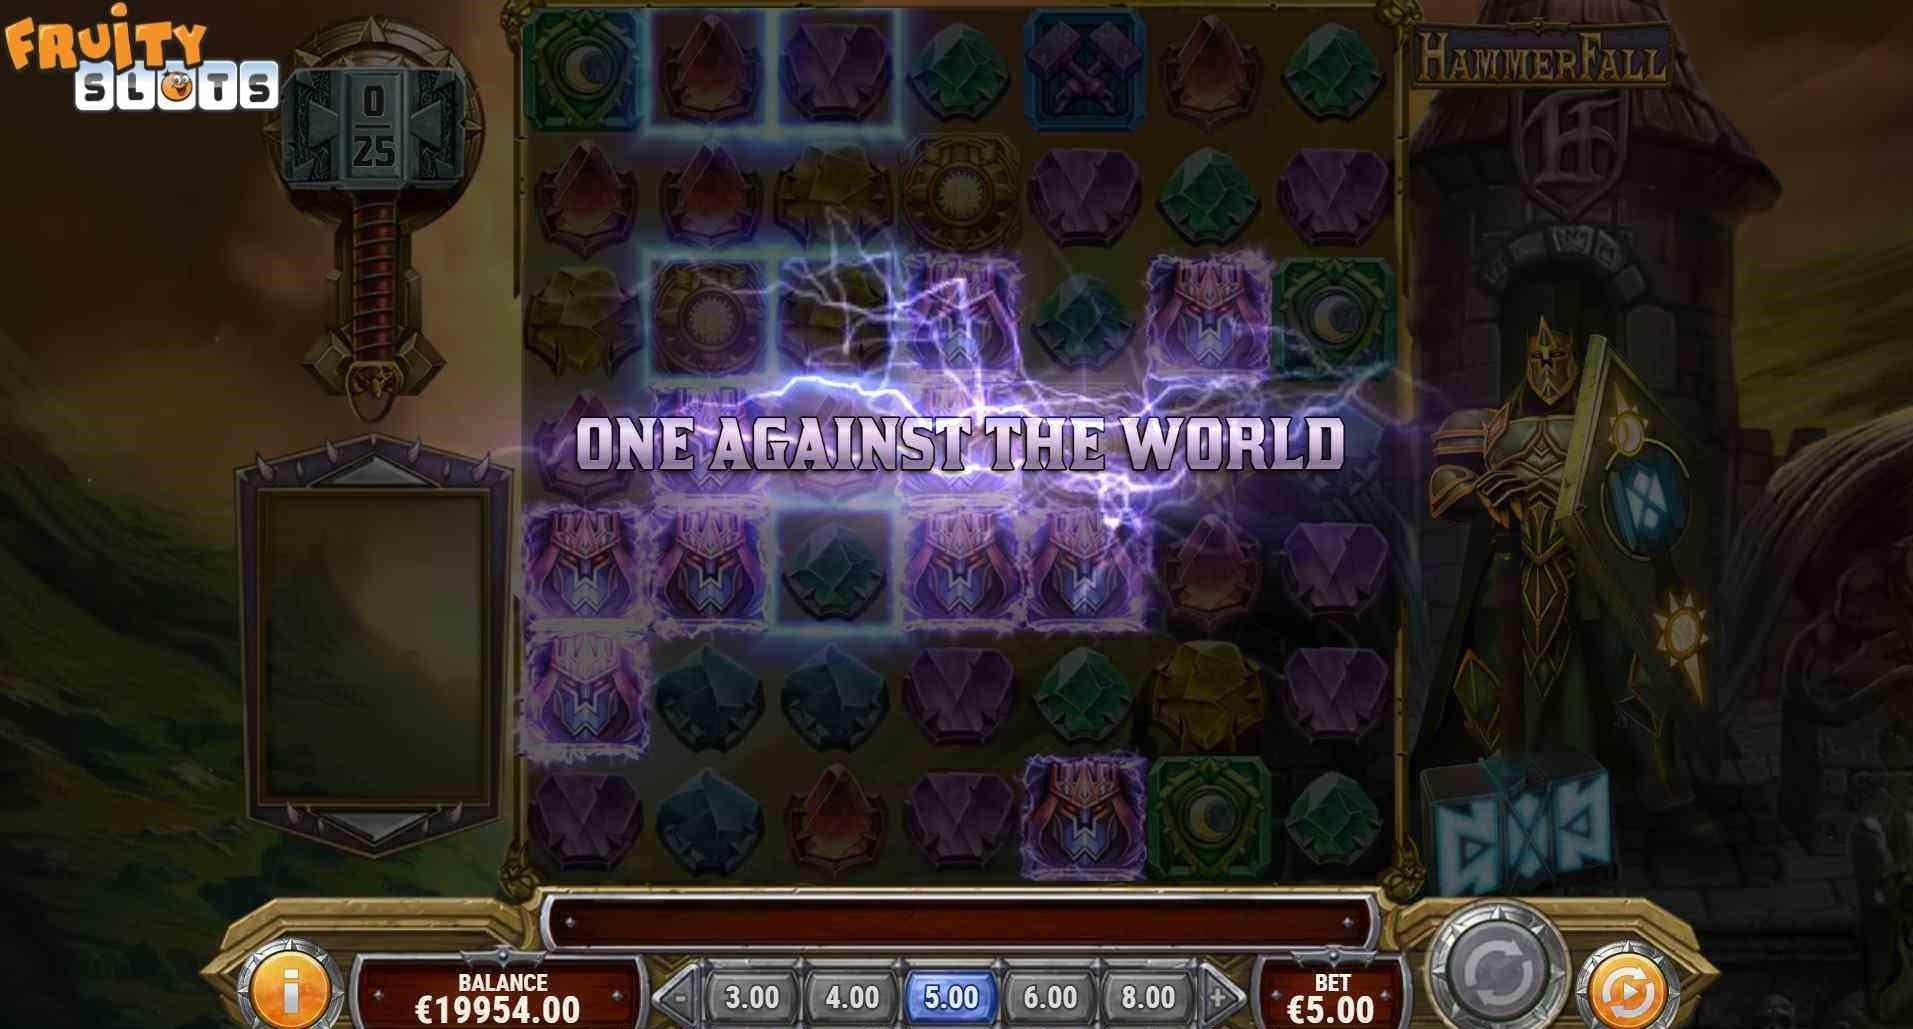 Hammerfall Slot Feature